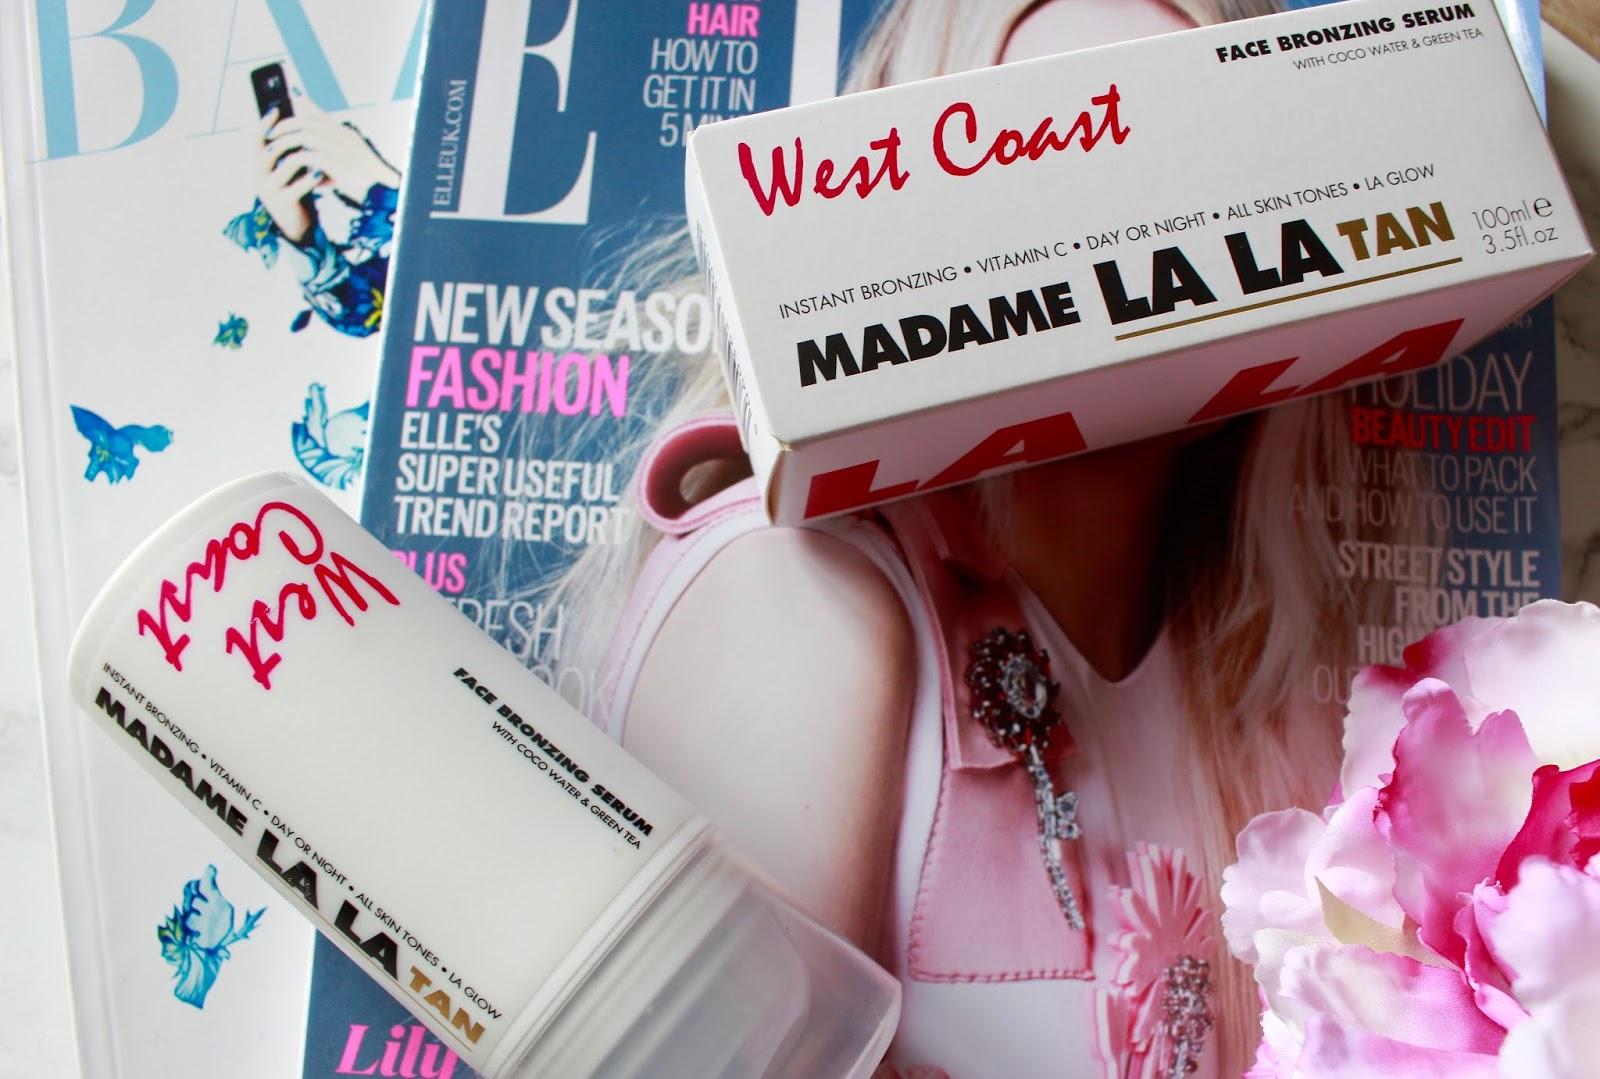 Madame LA LA UK Bronzing Serum Review